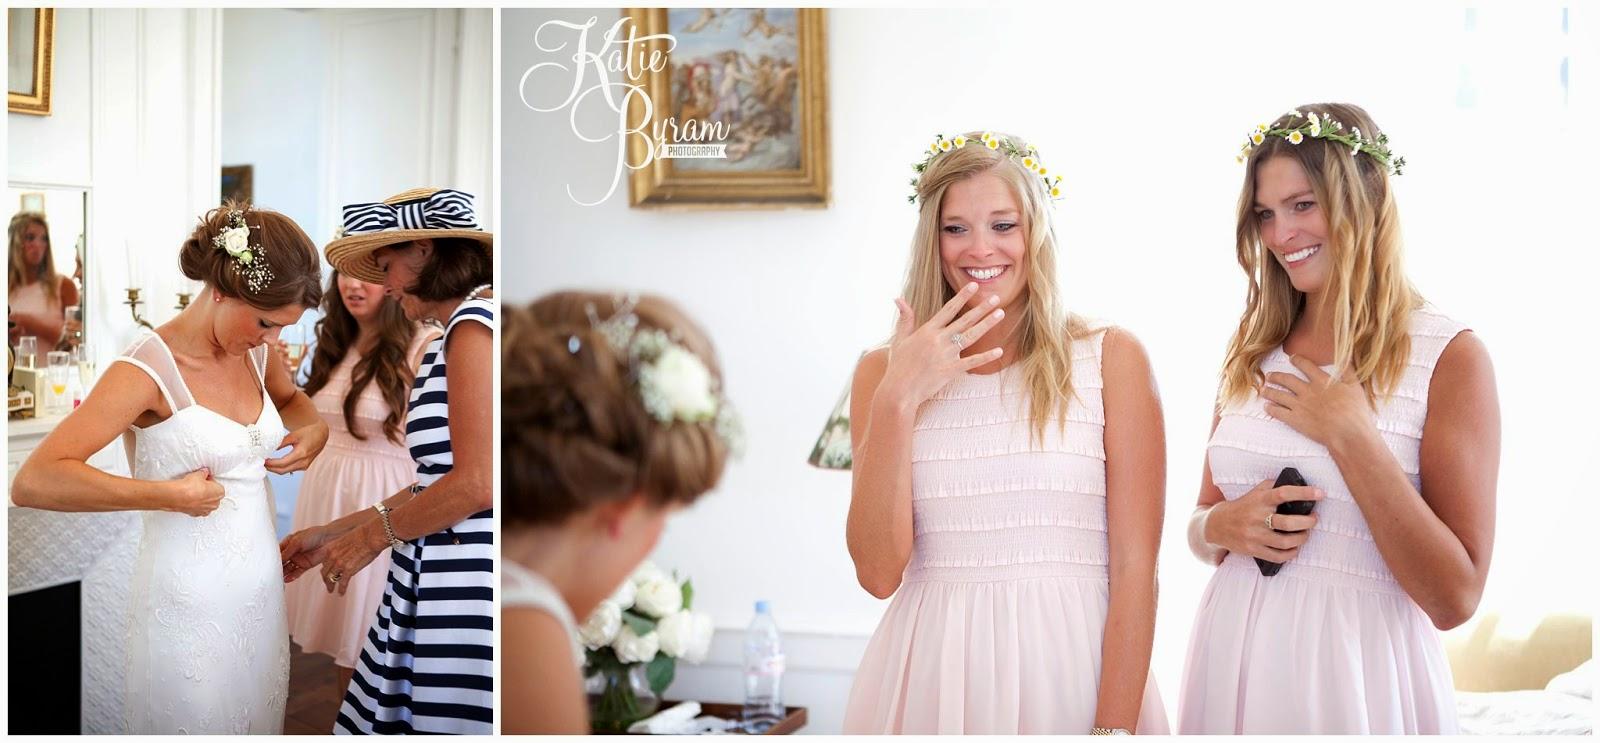 chateau de lacoste wedding, sarlat, french wedding, katie byram photography